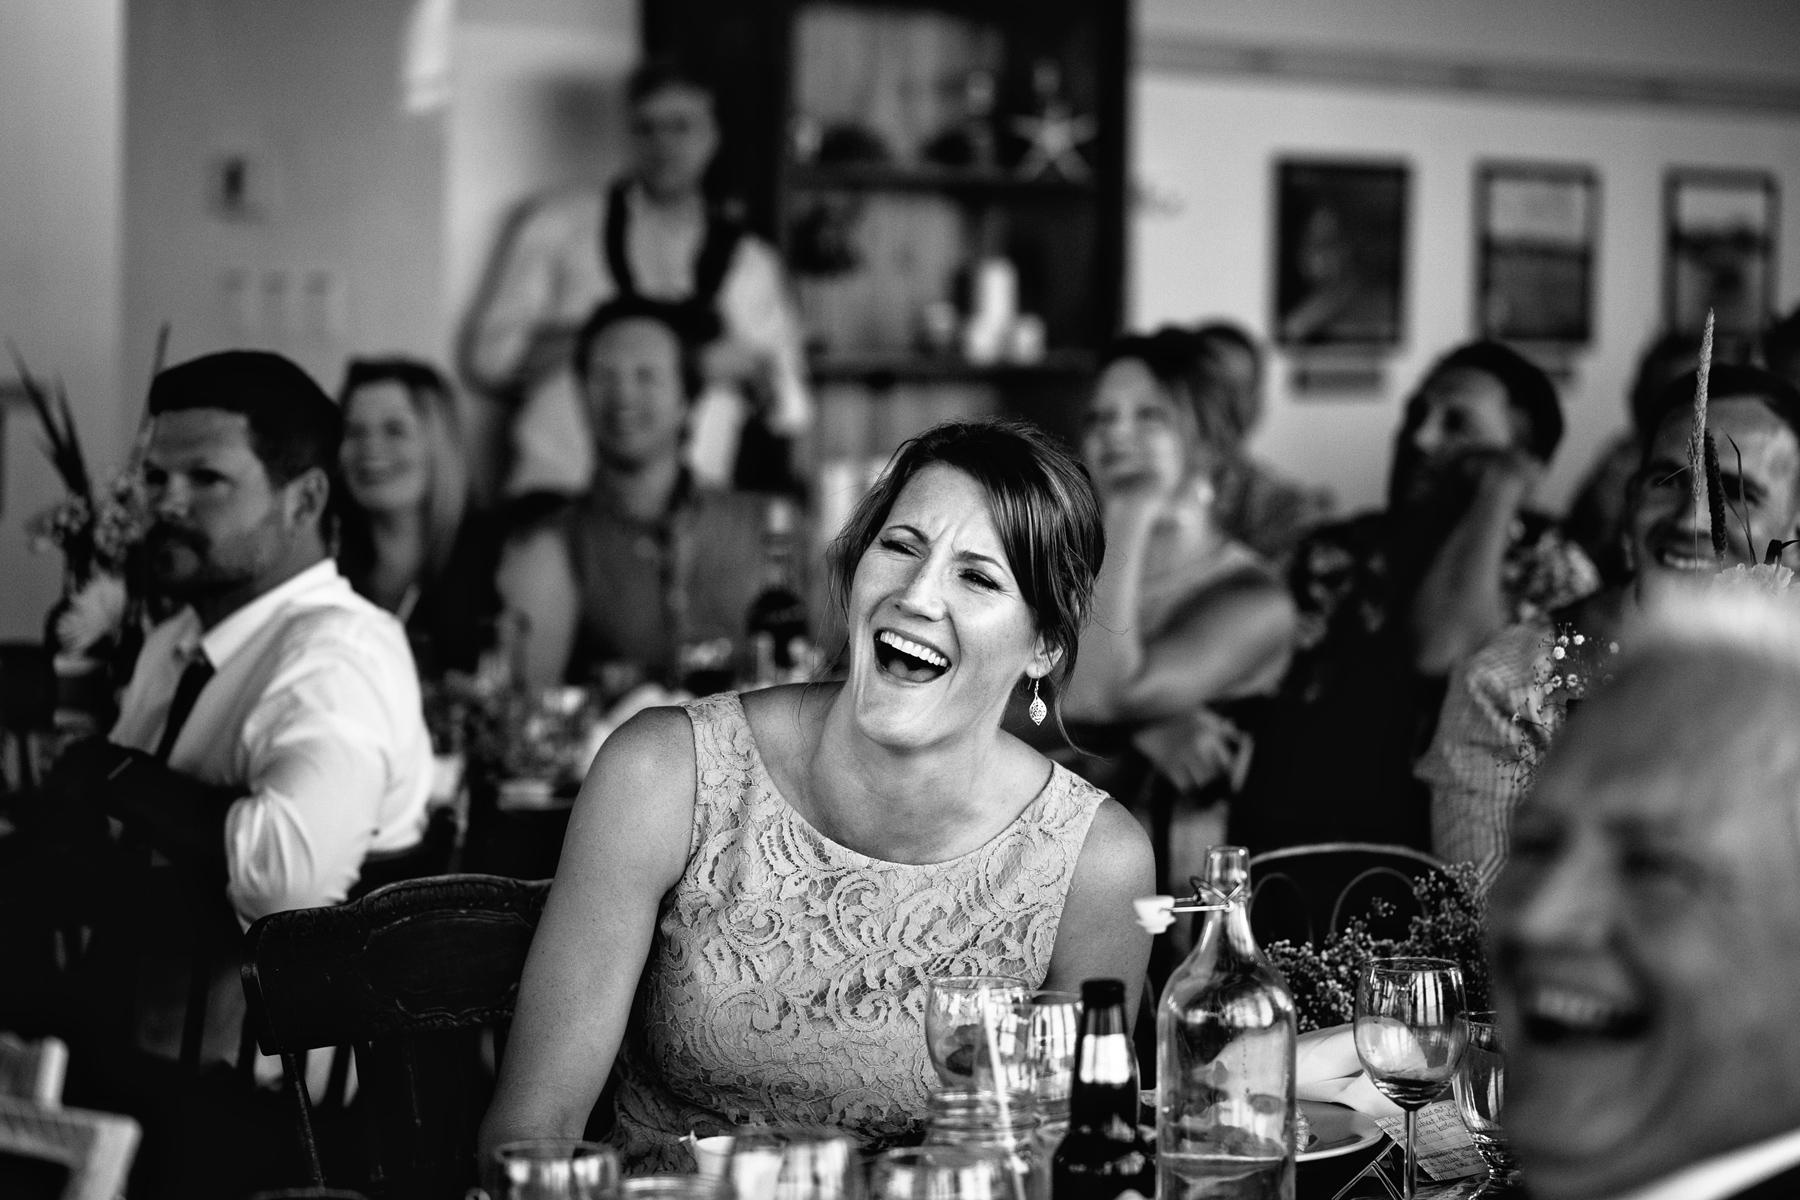 054-awesome-pei-wedding-photography-kandisebrown